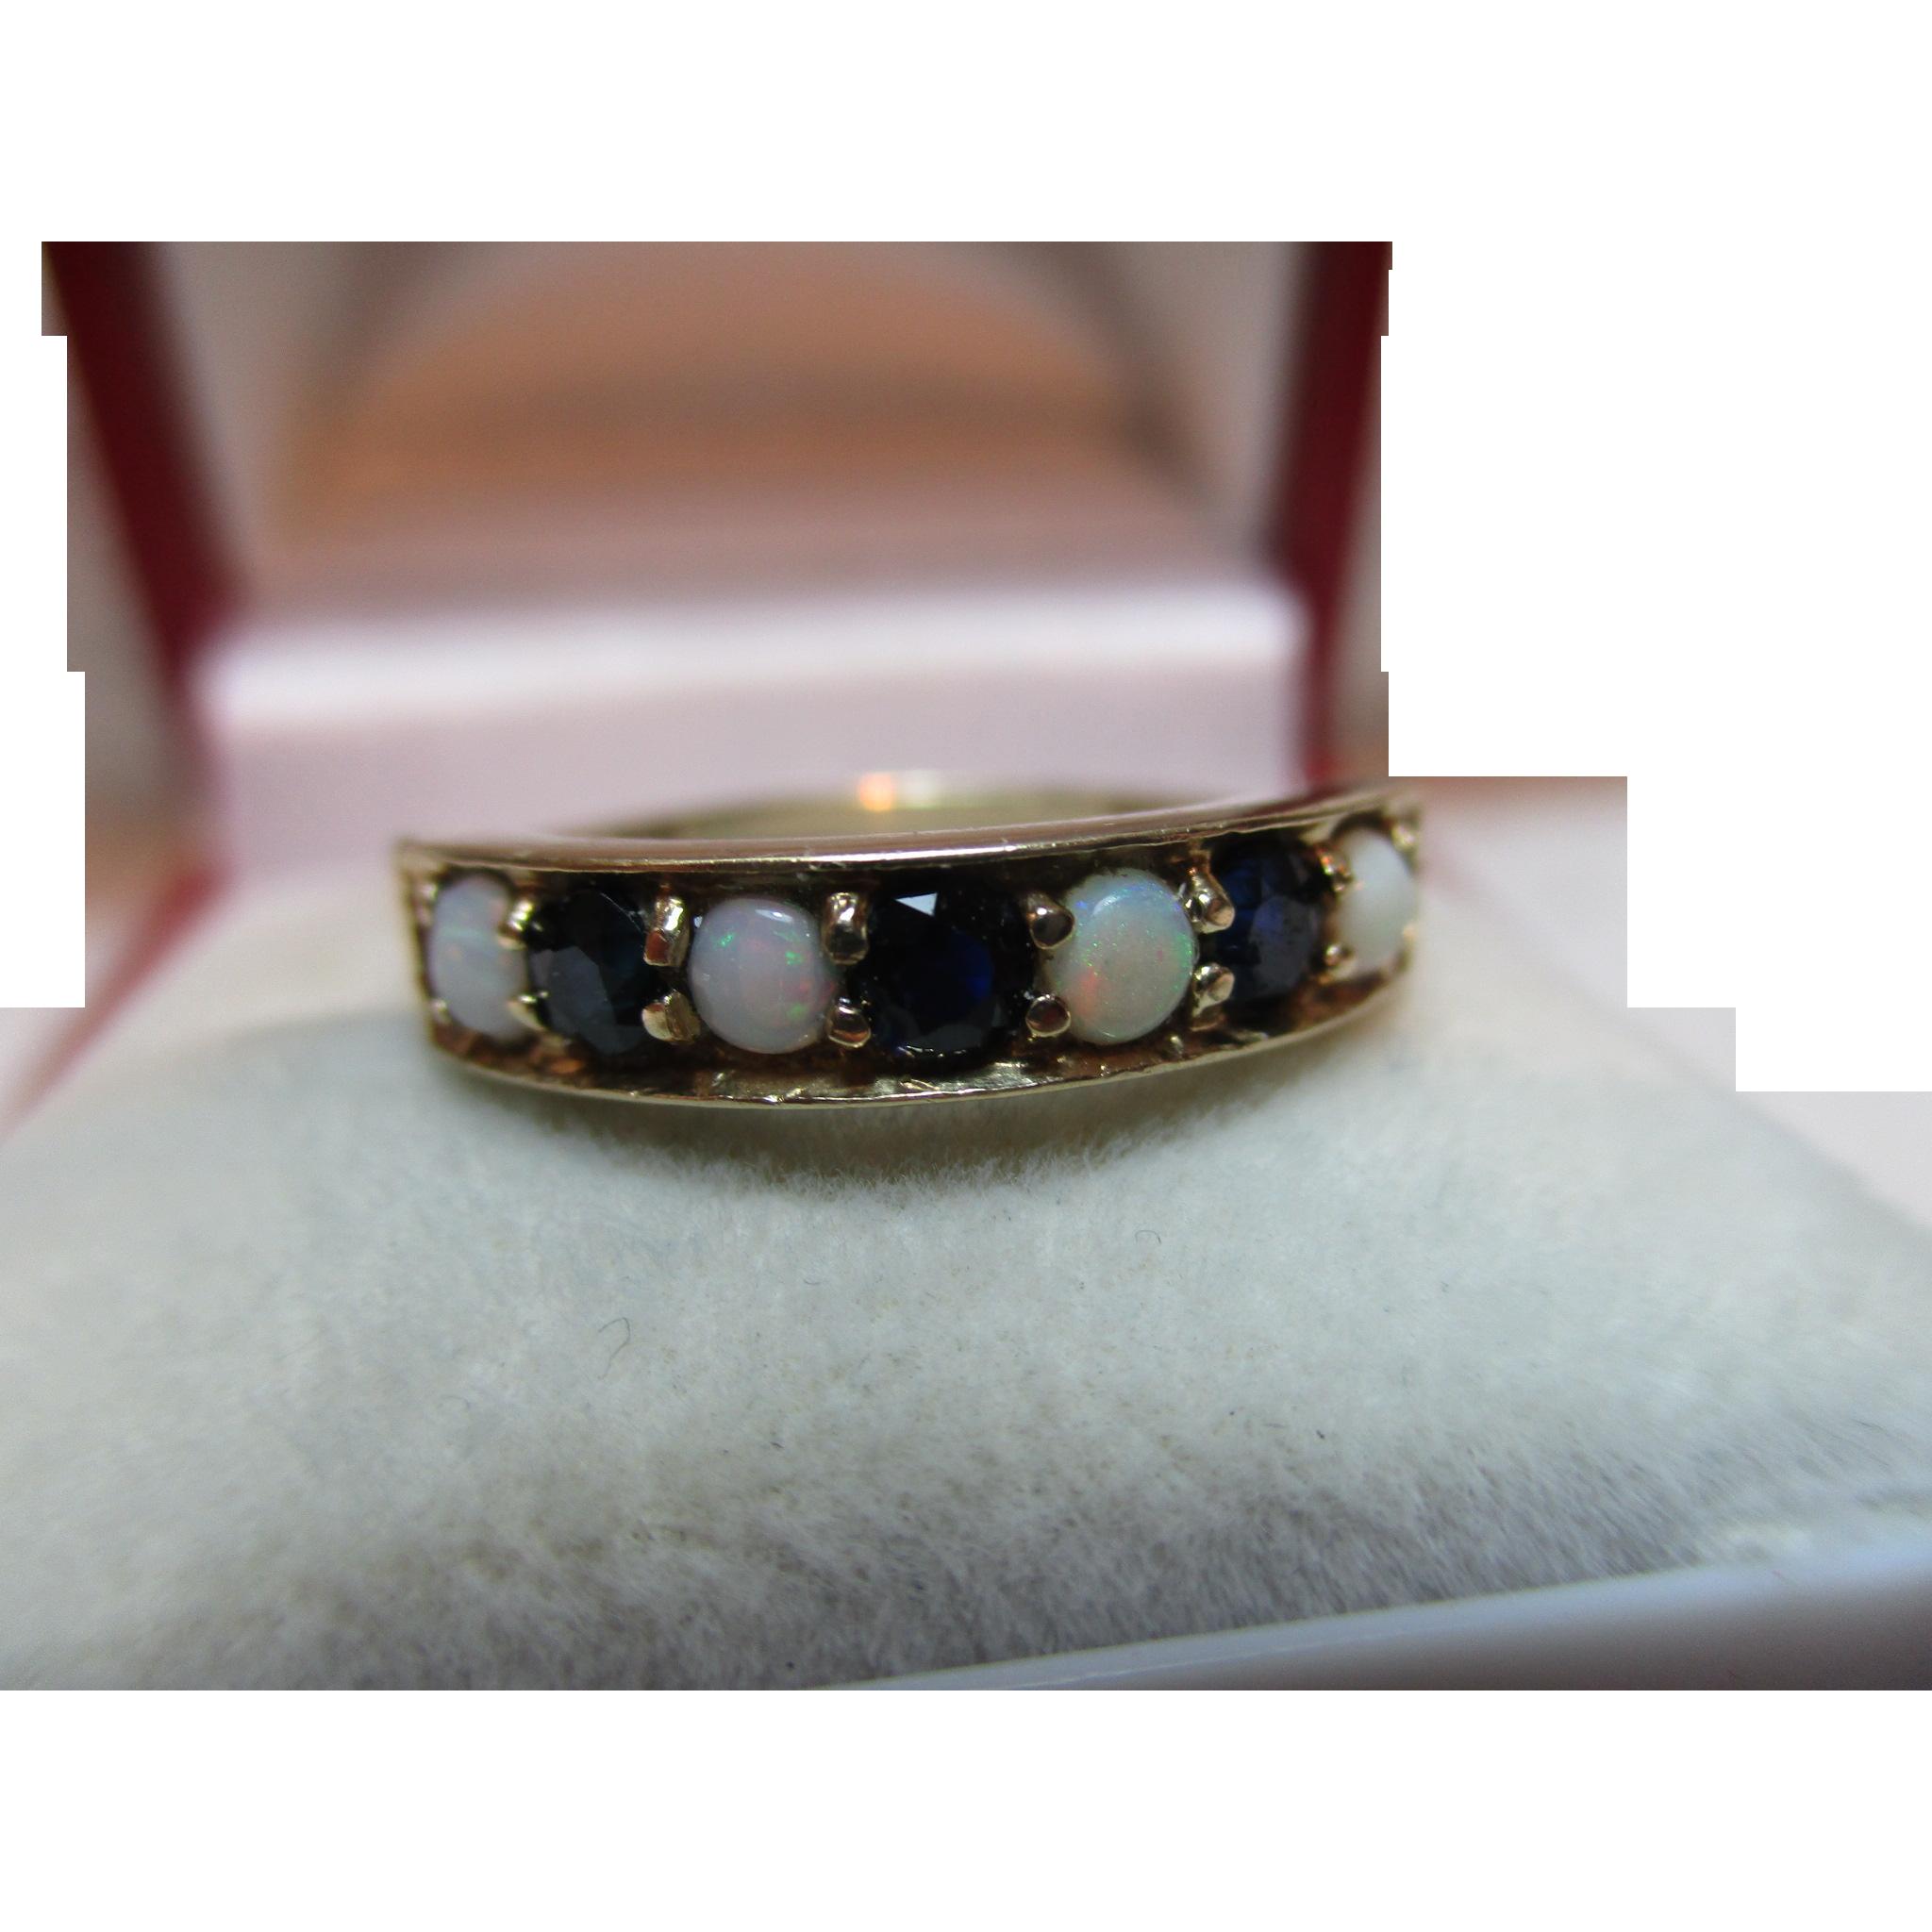 Pretty Vintage{London 1976} 9ct Solid Gold 7-Stone Dark Sapphire + Opal Gemstone 'Half Eternity' Ring